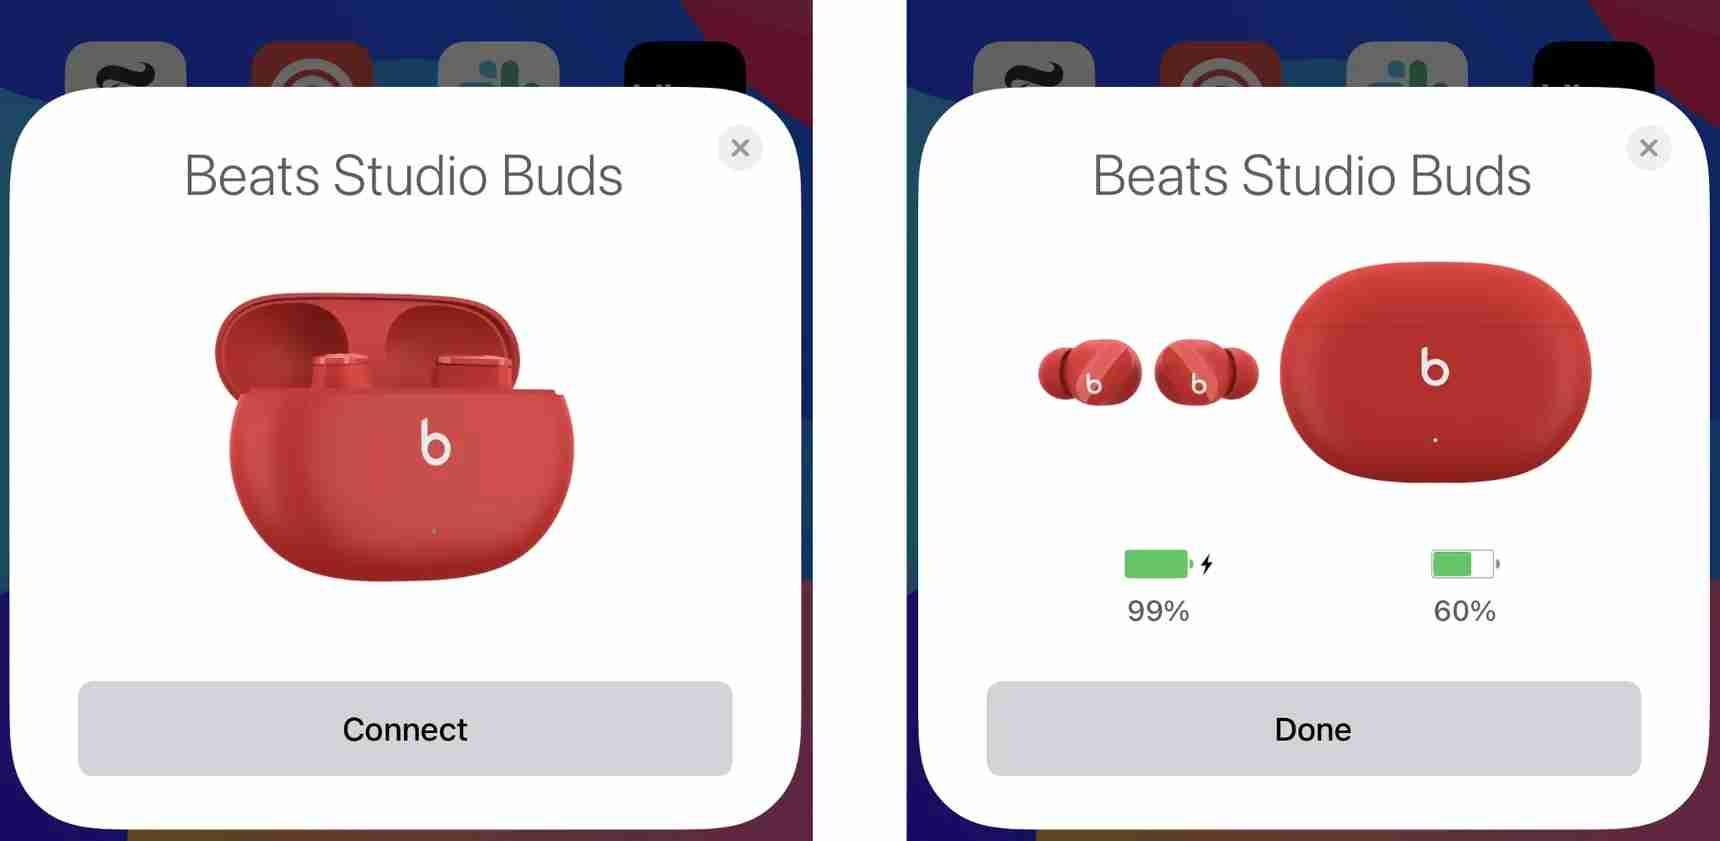 beat_studio_buds_ios